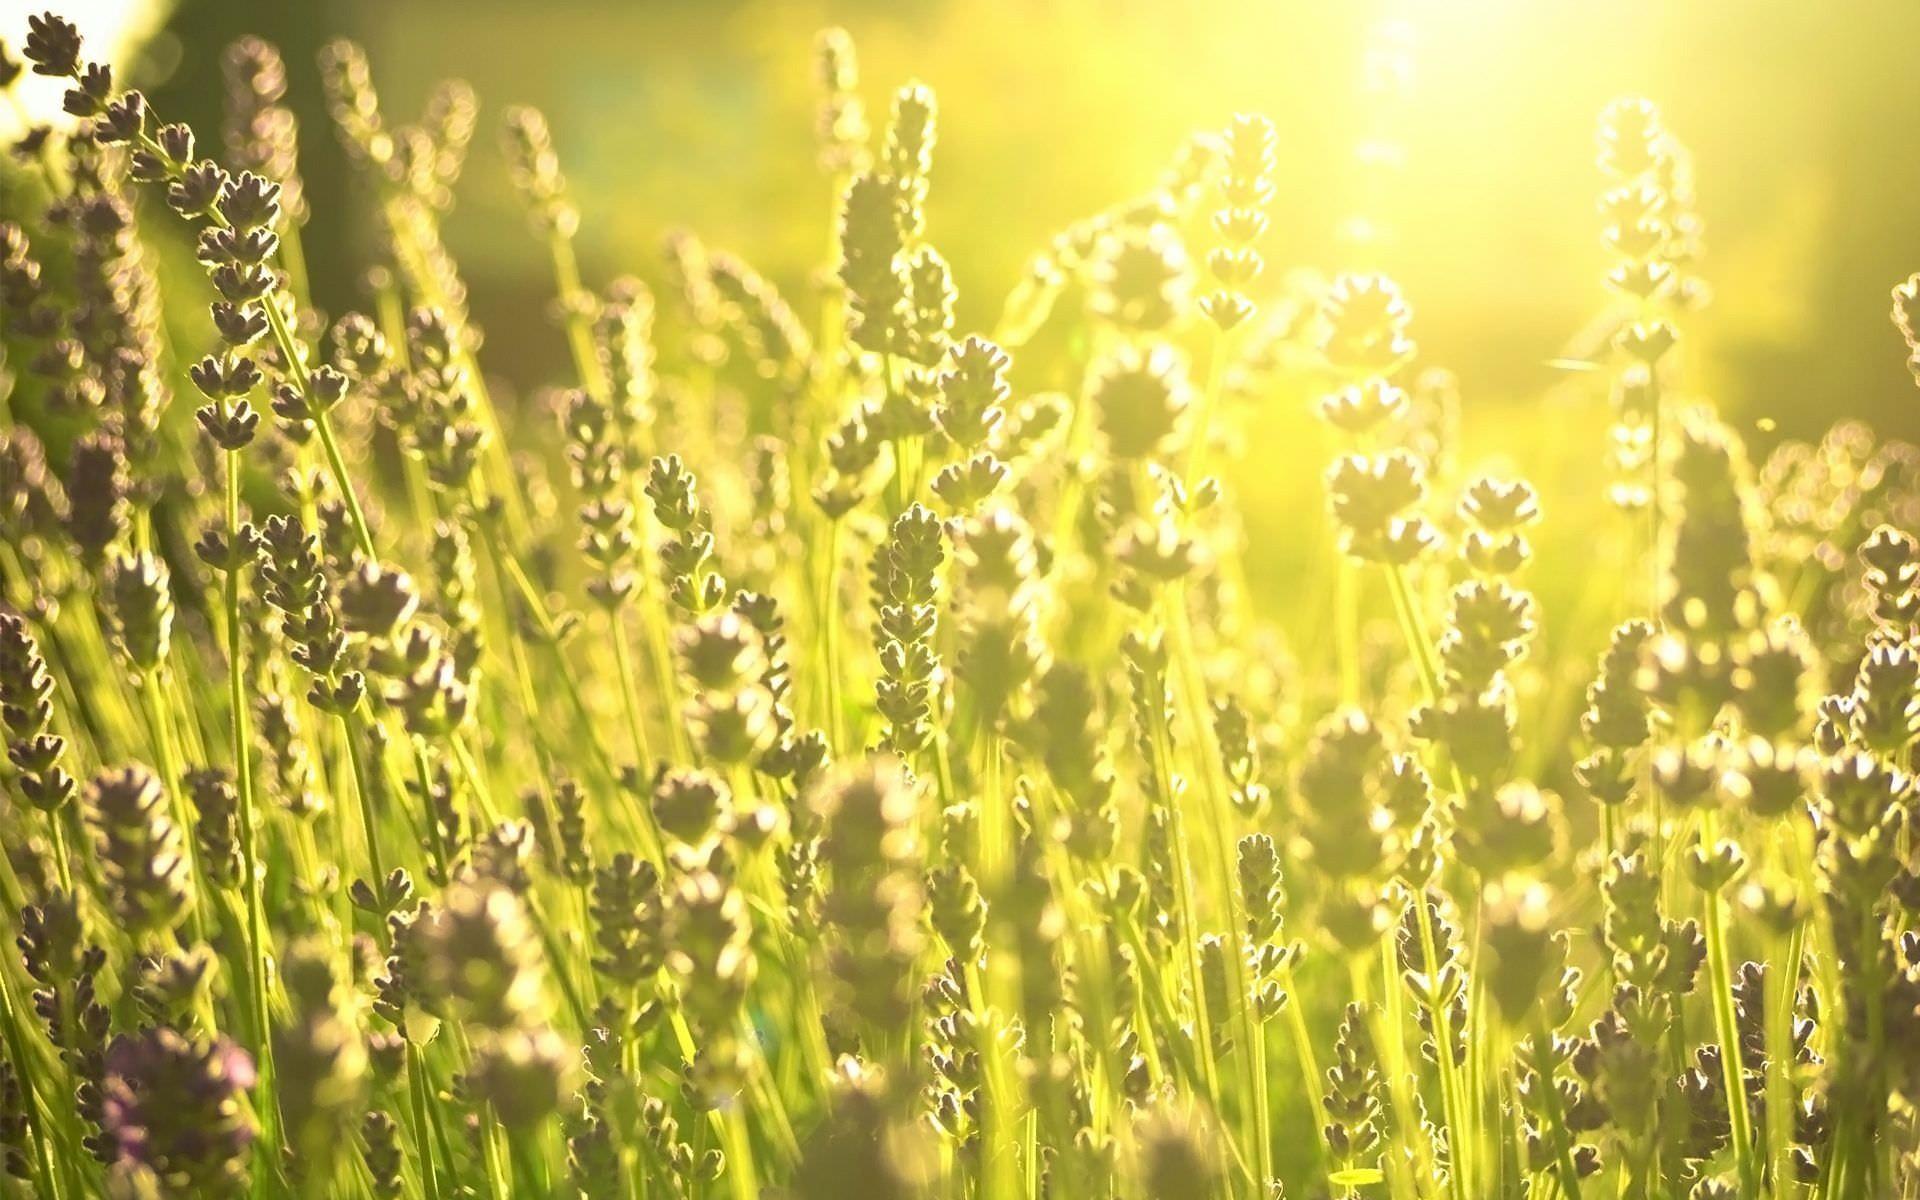 Free Daylight Green Fields phone wallpaper by suziq13036